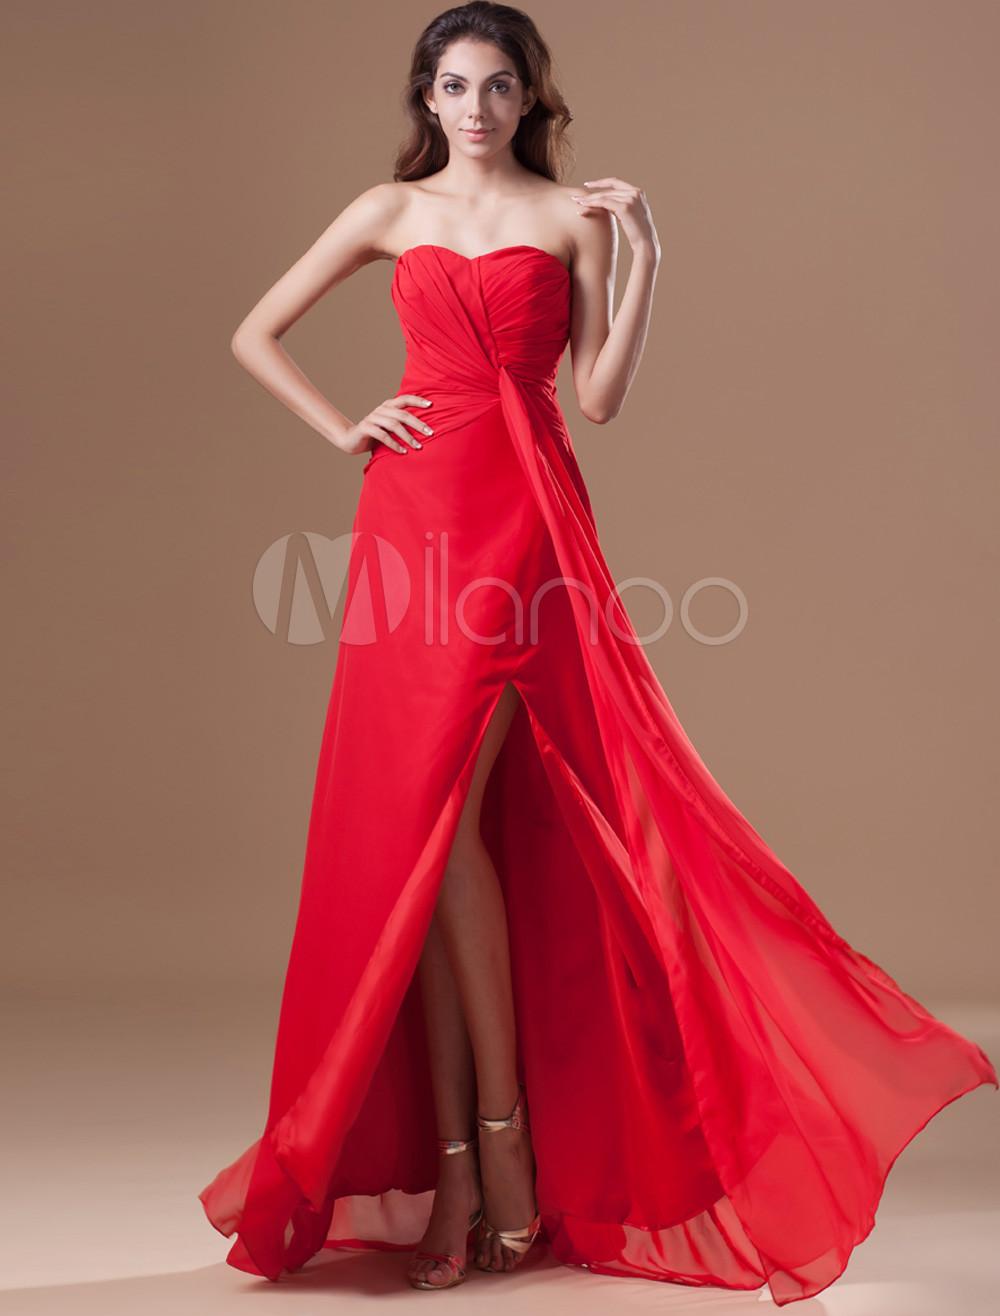 Grace Red Chiffon Side Split Sweetheart Neck Women's Evening Dress (Wedding Evening Dresses) photo